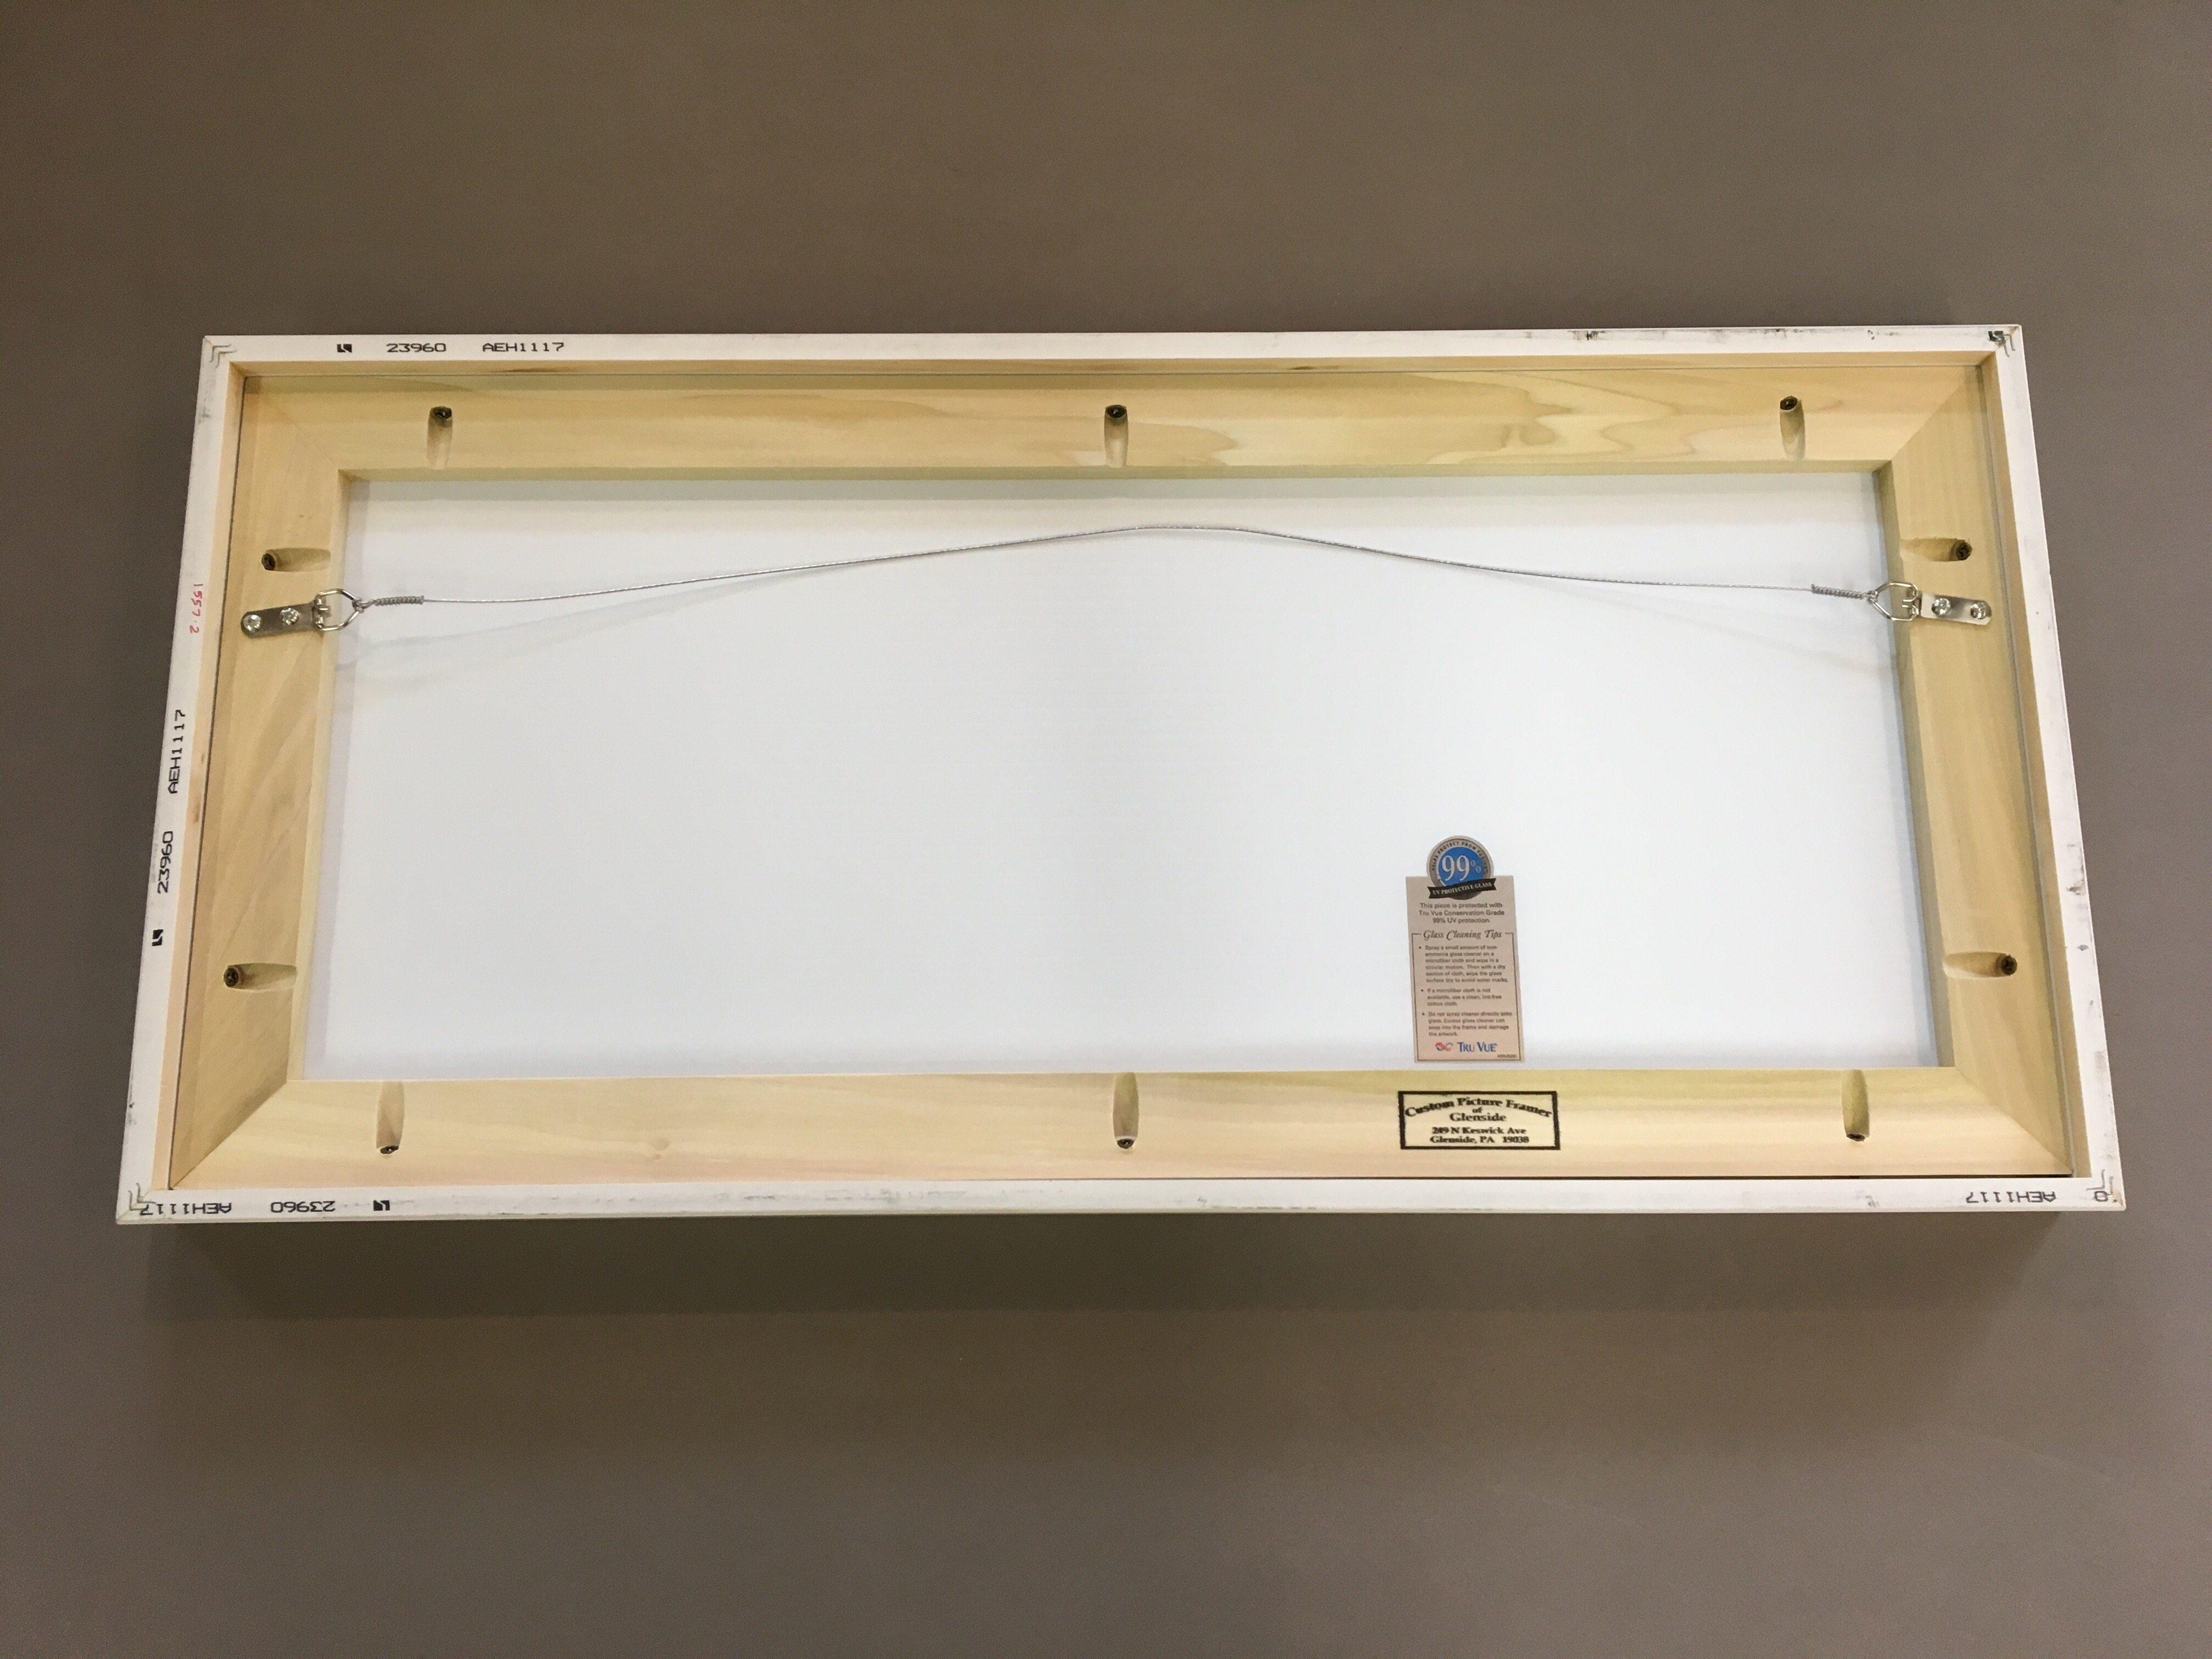 The back of a strainer reinforced custom frame